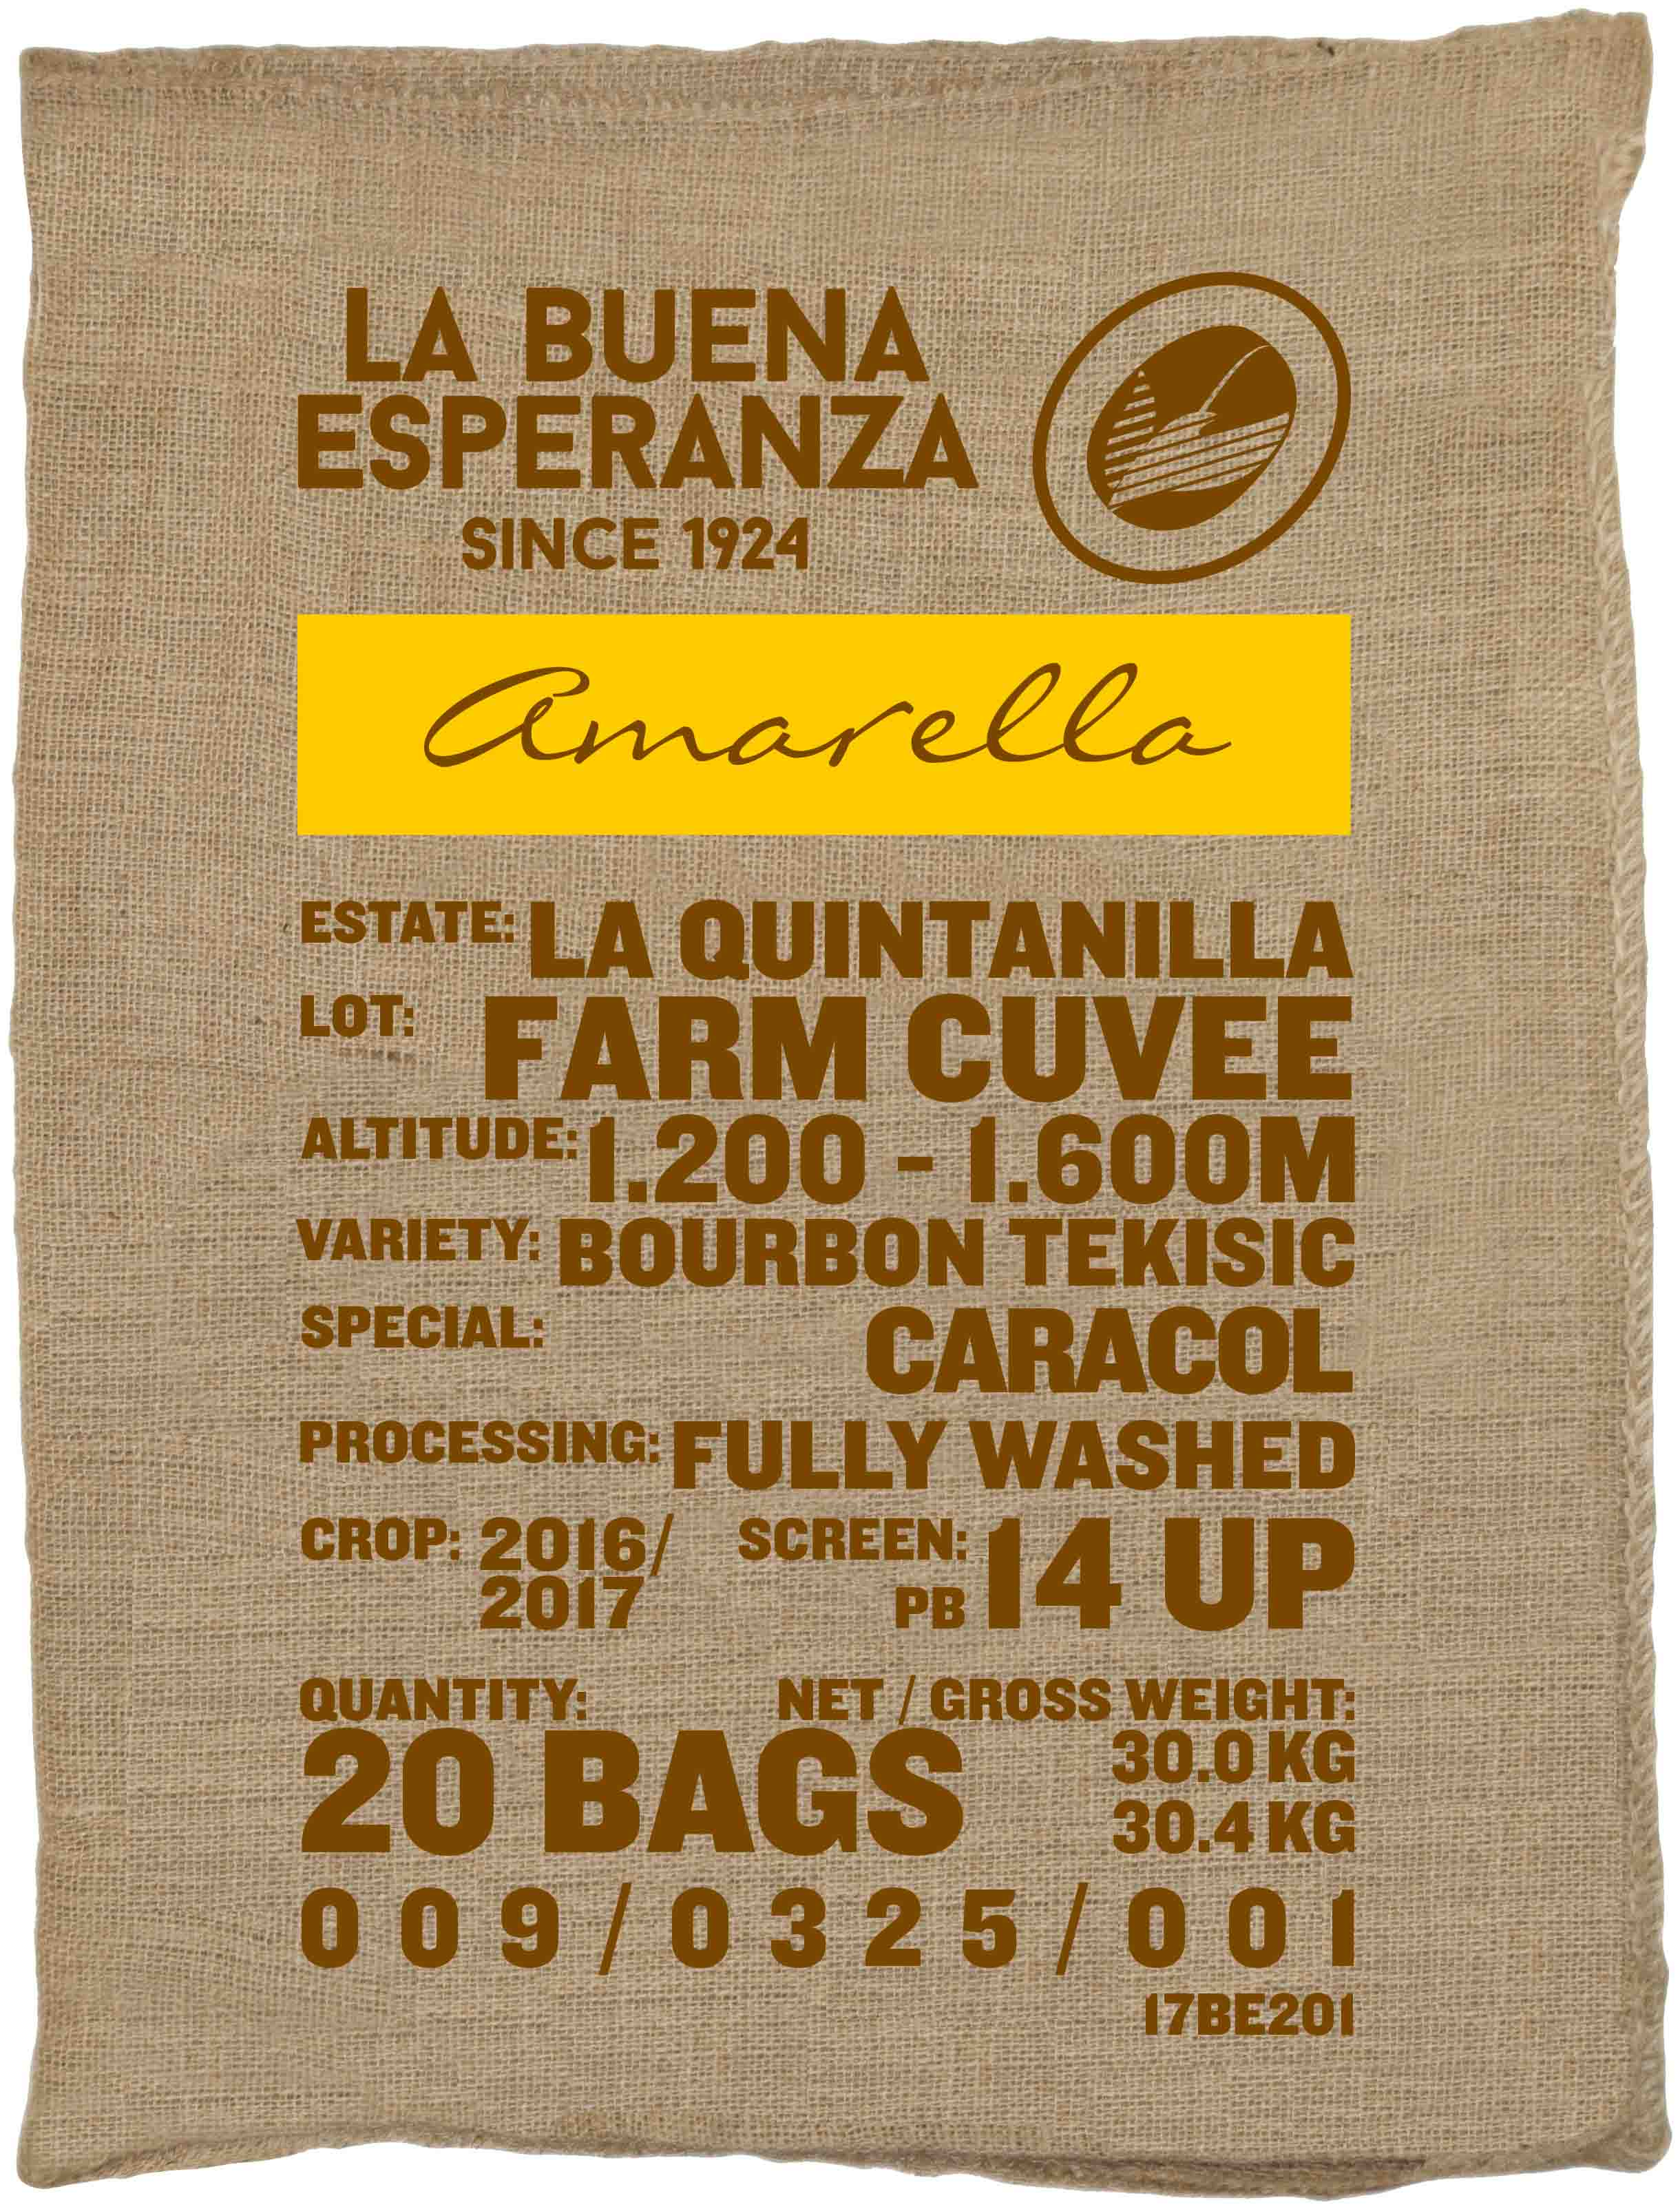 Ein Rohkaffeesack amarella Parzellenkaffee Varietät Bourbon Tekisic. Finca La Buena Esperanza Lot Farm Cuvee.